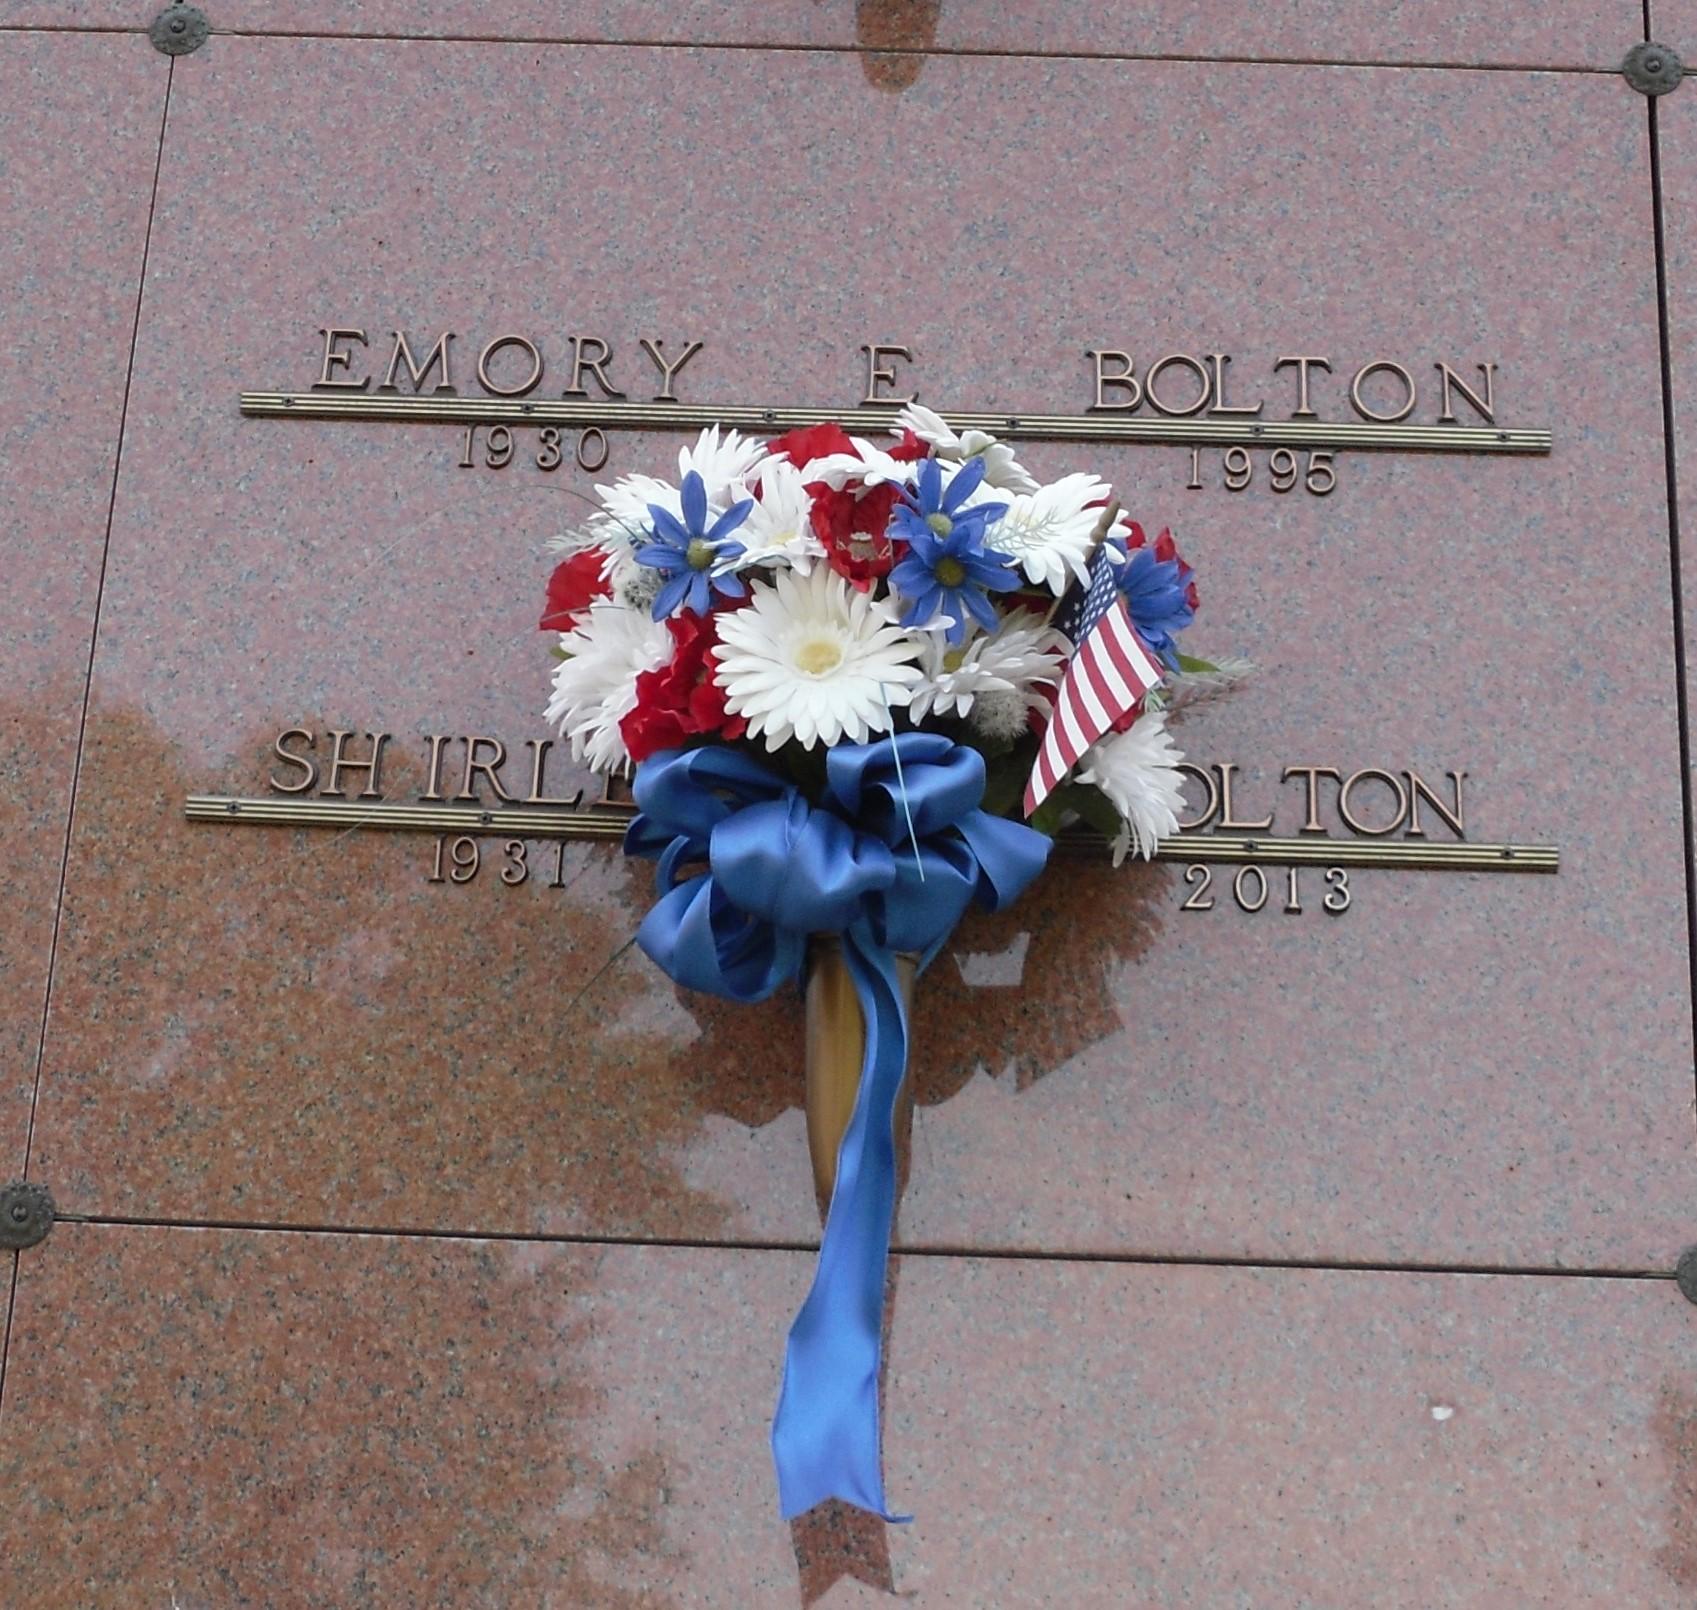 Shirley ruth tilley bolton 1931 2013 find a grave memorial view original izmirmasajfo